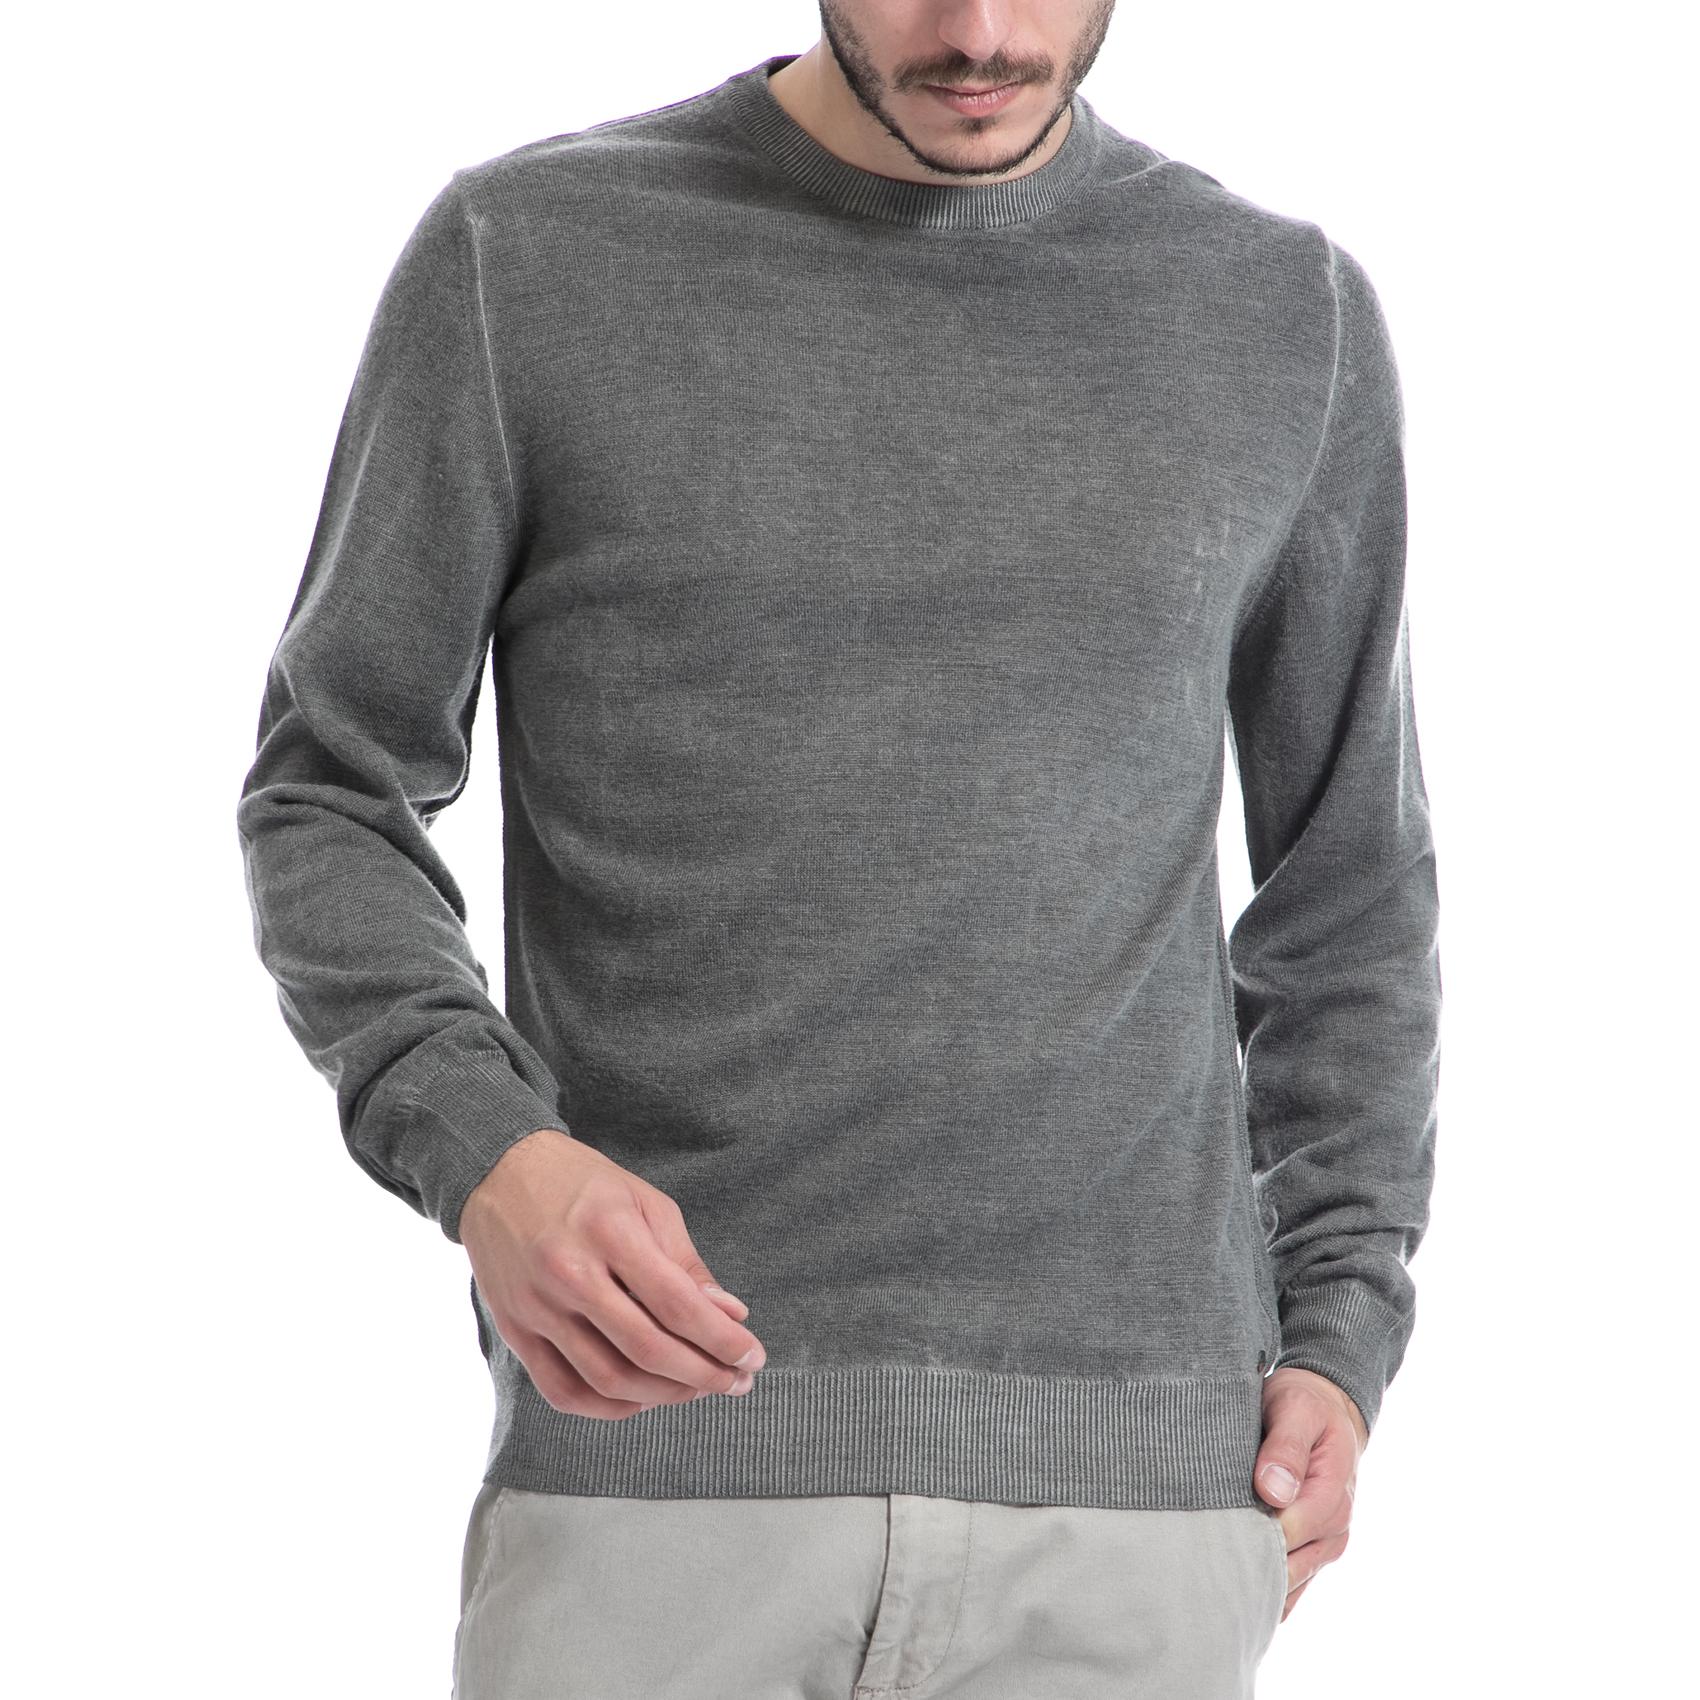 GAUDI - Ανδρική μπλούζα Gaudi γκρι 91e8e2c1460